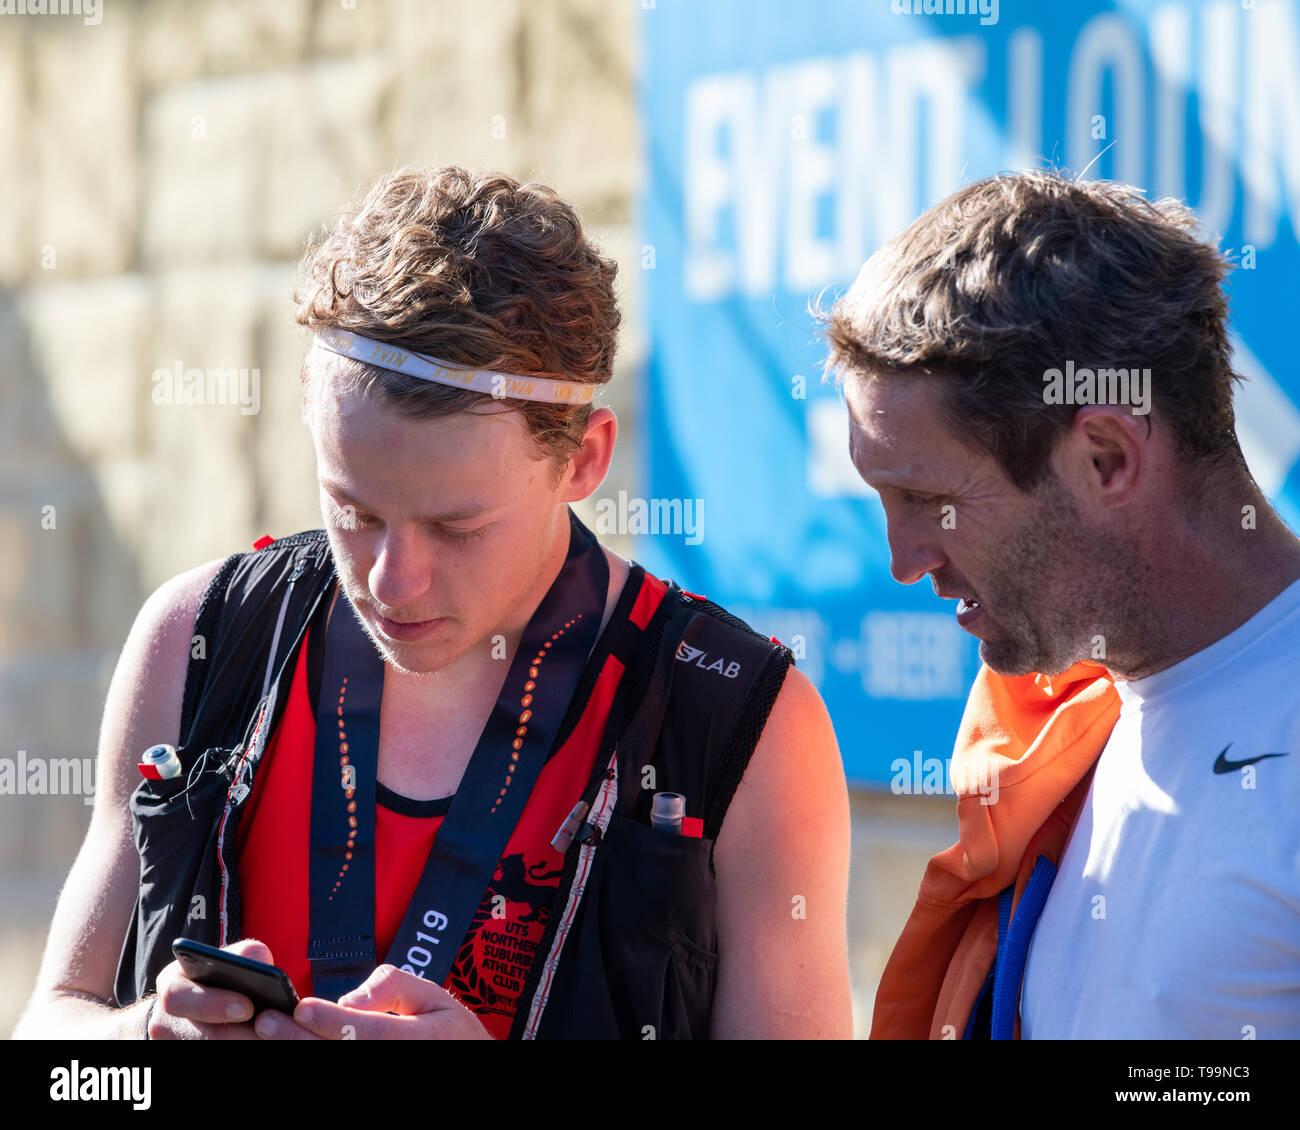 Blue Mountains, Australia - April 16 2019: Ultra-Trail Australia UTA11 race. Runner Will Atkinson, runner up, checking the race statistics at the fini - Stock Image